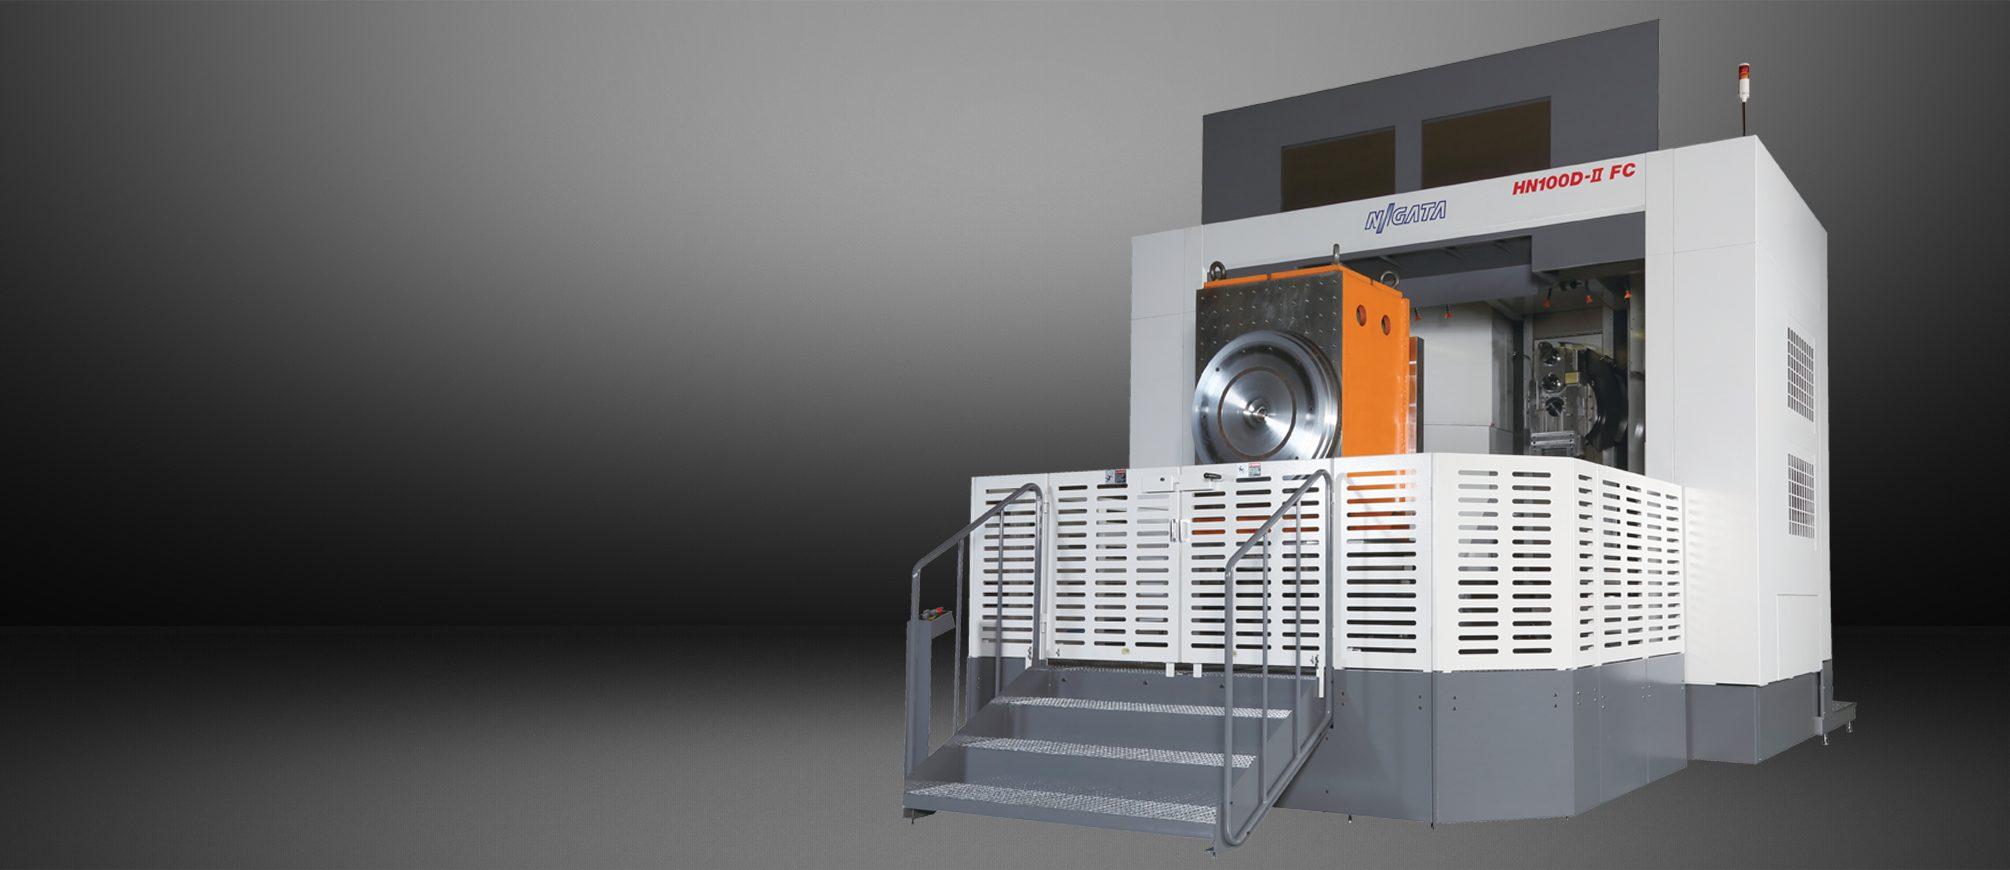 HN100D-II FC Horizontal Machining Centers